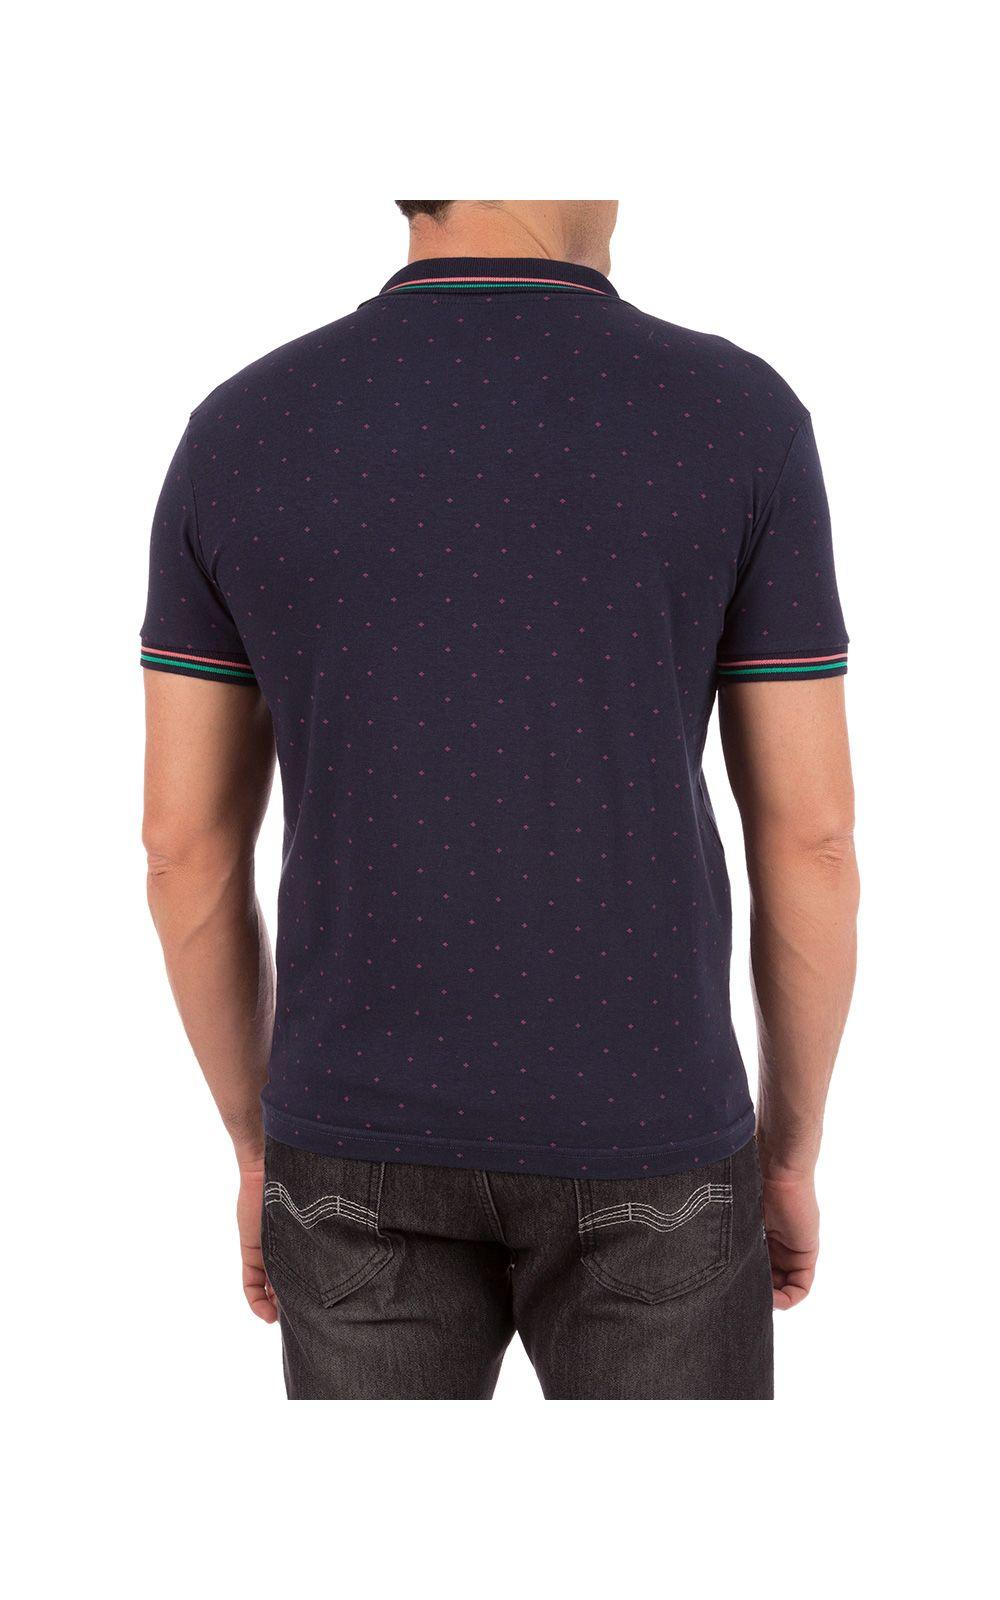 Foto 2 - Camisa Polo Masculina Azul Marinho Estampada